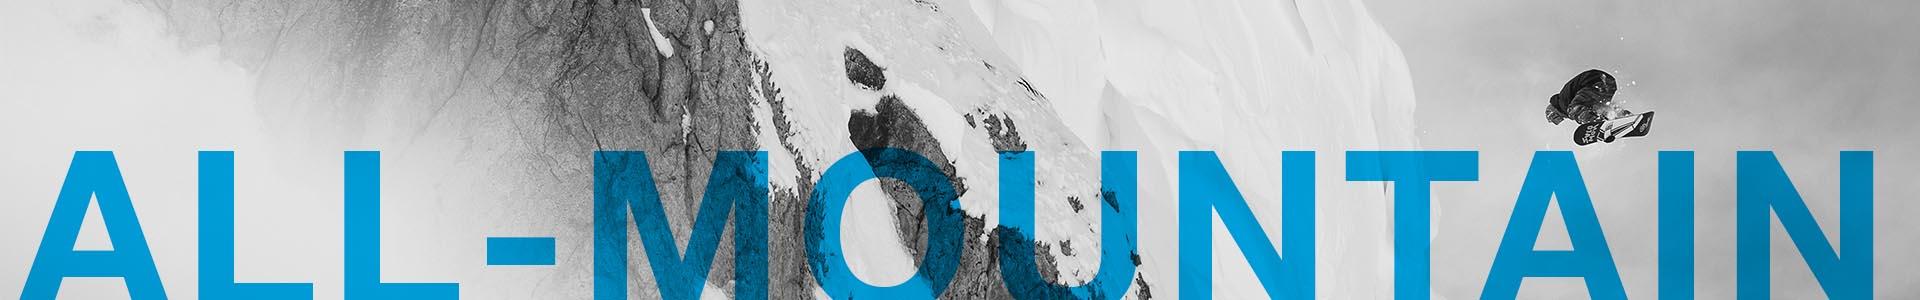 snowboard-snowboards-allmountain-1920x300.jpg